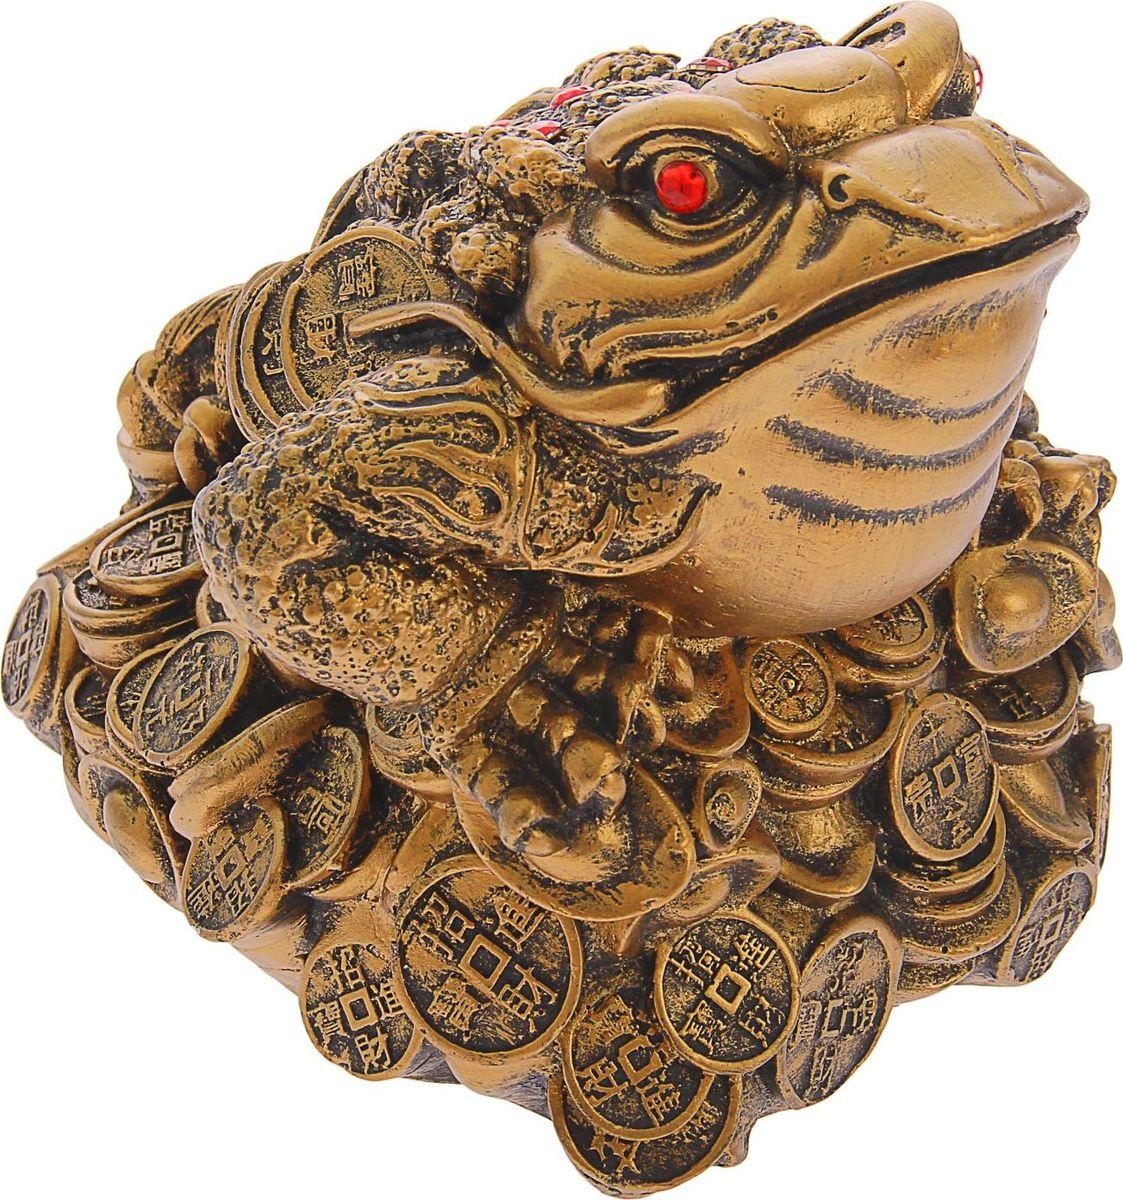 Копилка Premium Gips Жаба на монетах, 19 х 17 х 17 см копилка premium gips денежная жаба 17 см х 19 см х 17 см